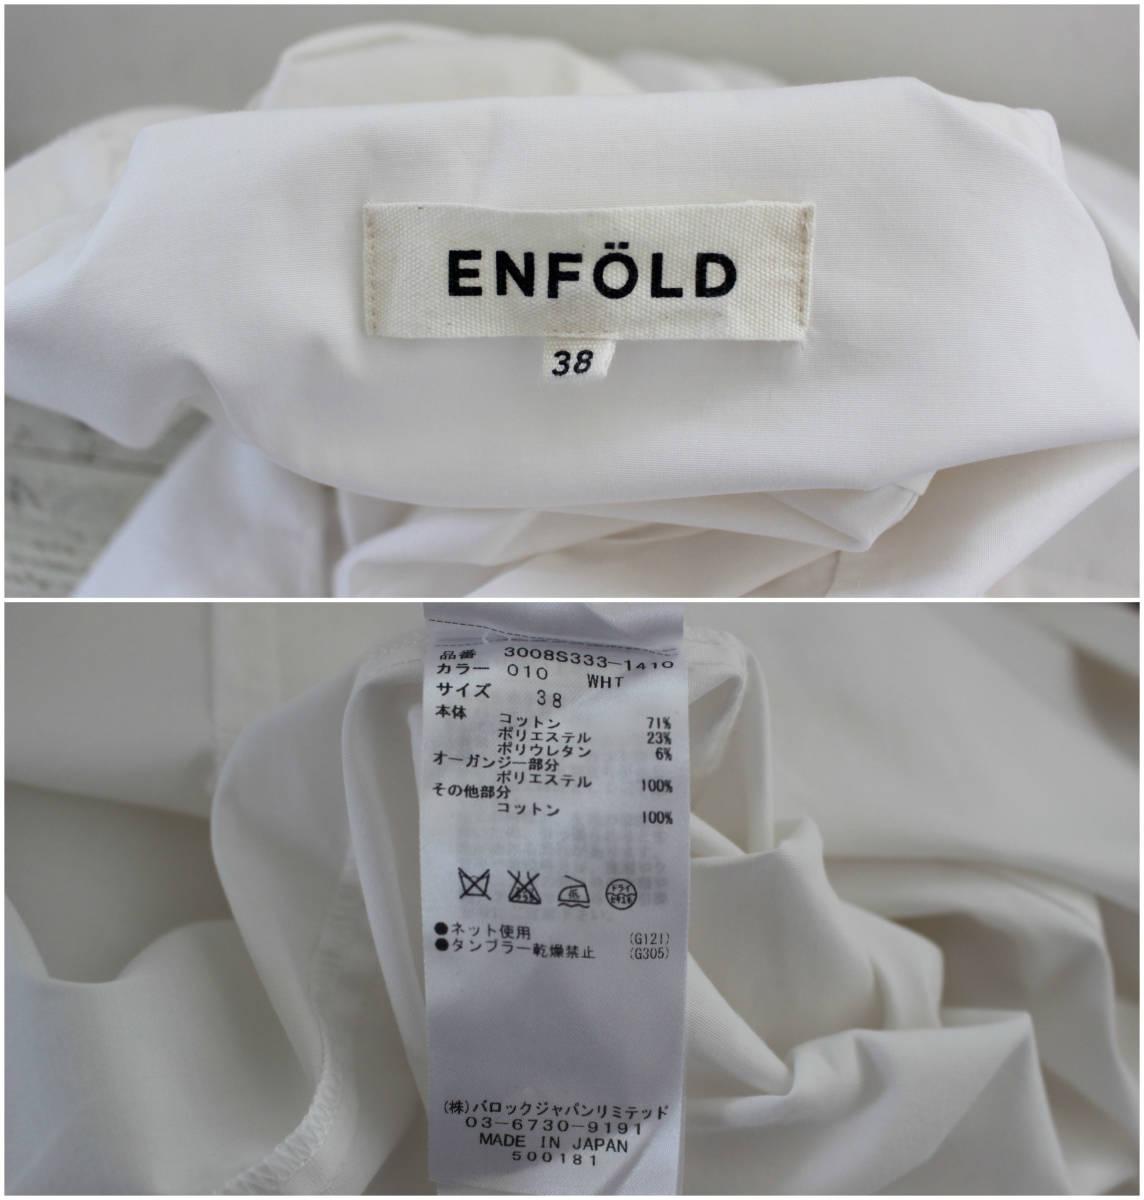 15ss/エンフォルド ENFOLD/レイヤードシャツワンピース/ロングシャツ_画像9